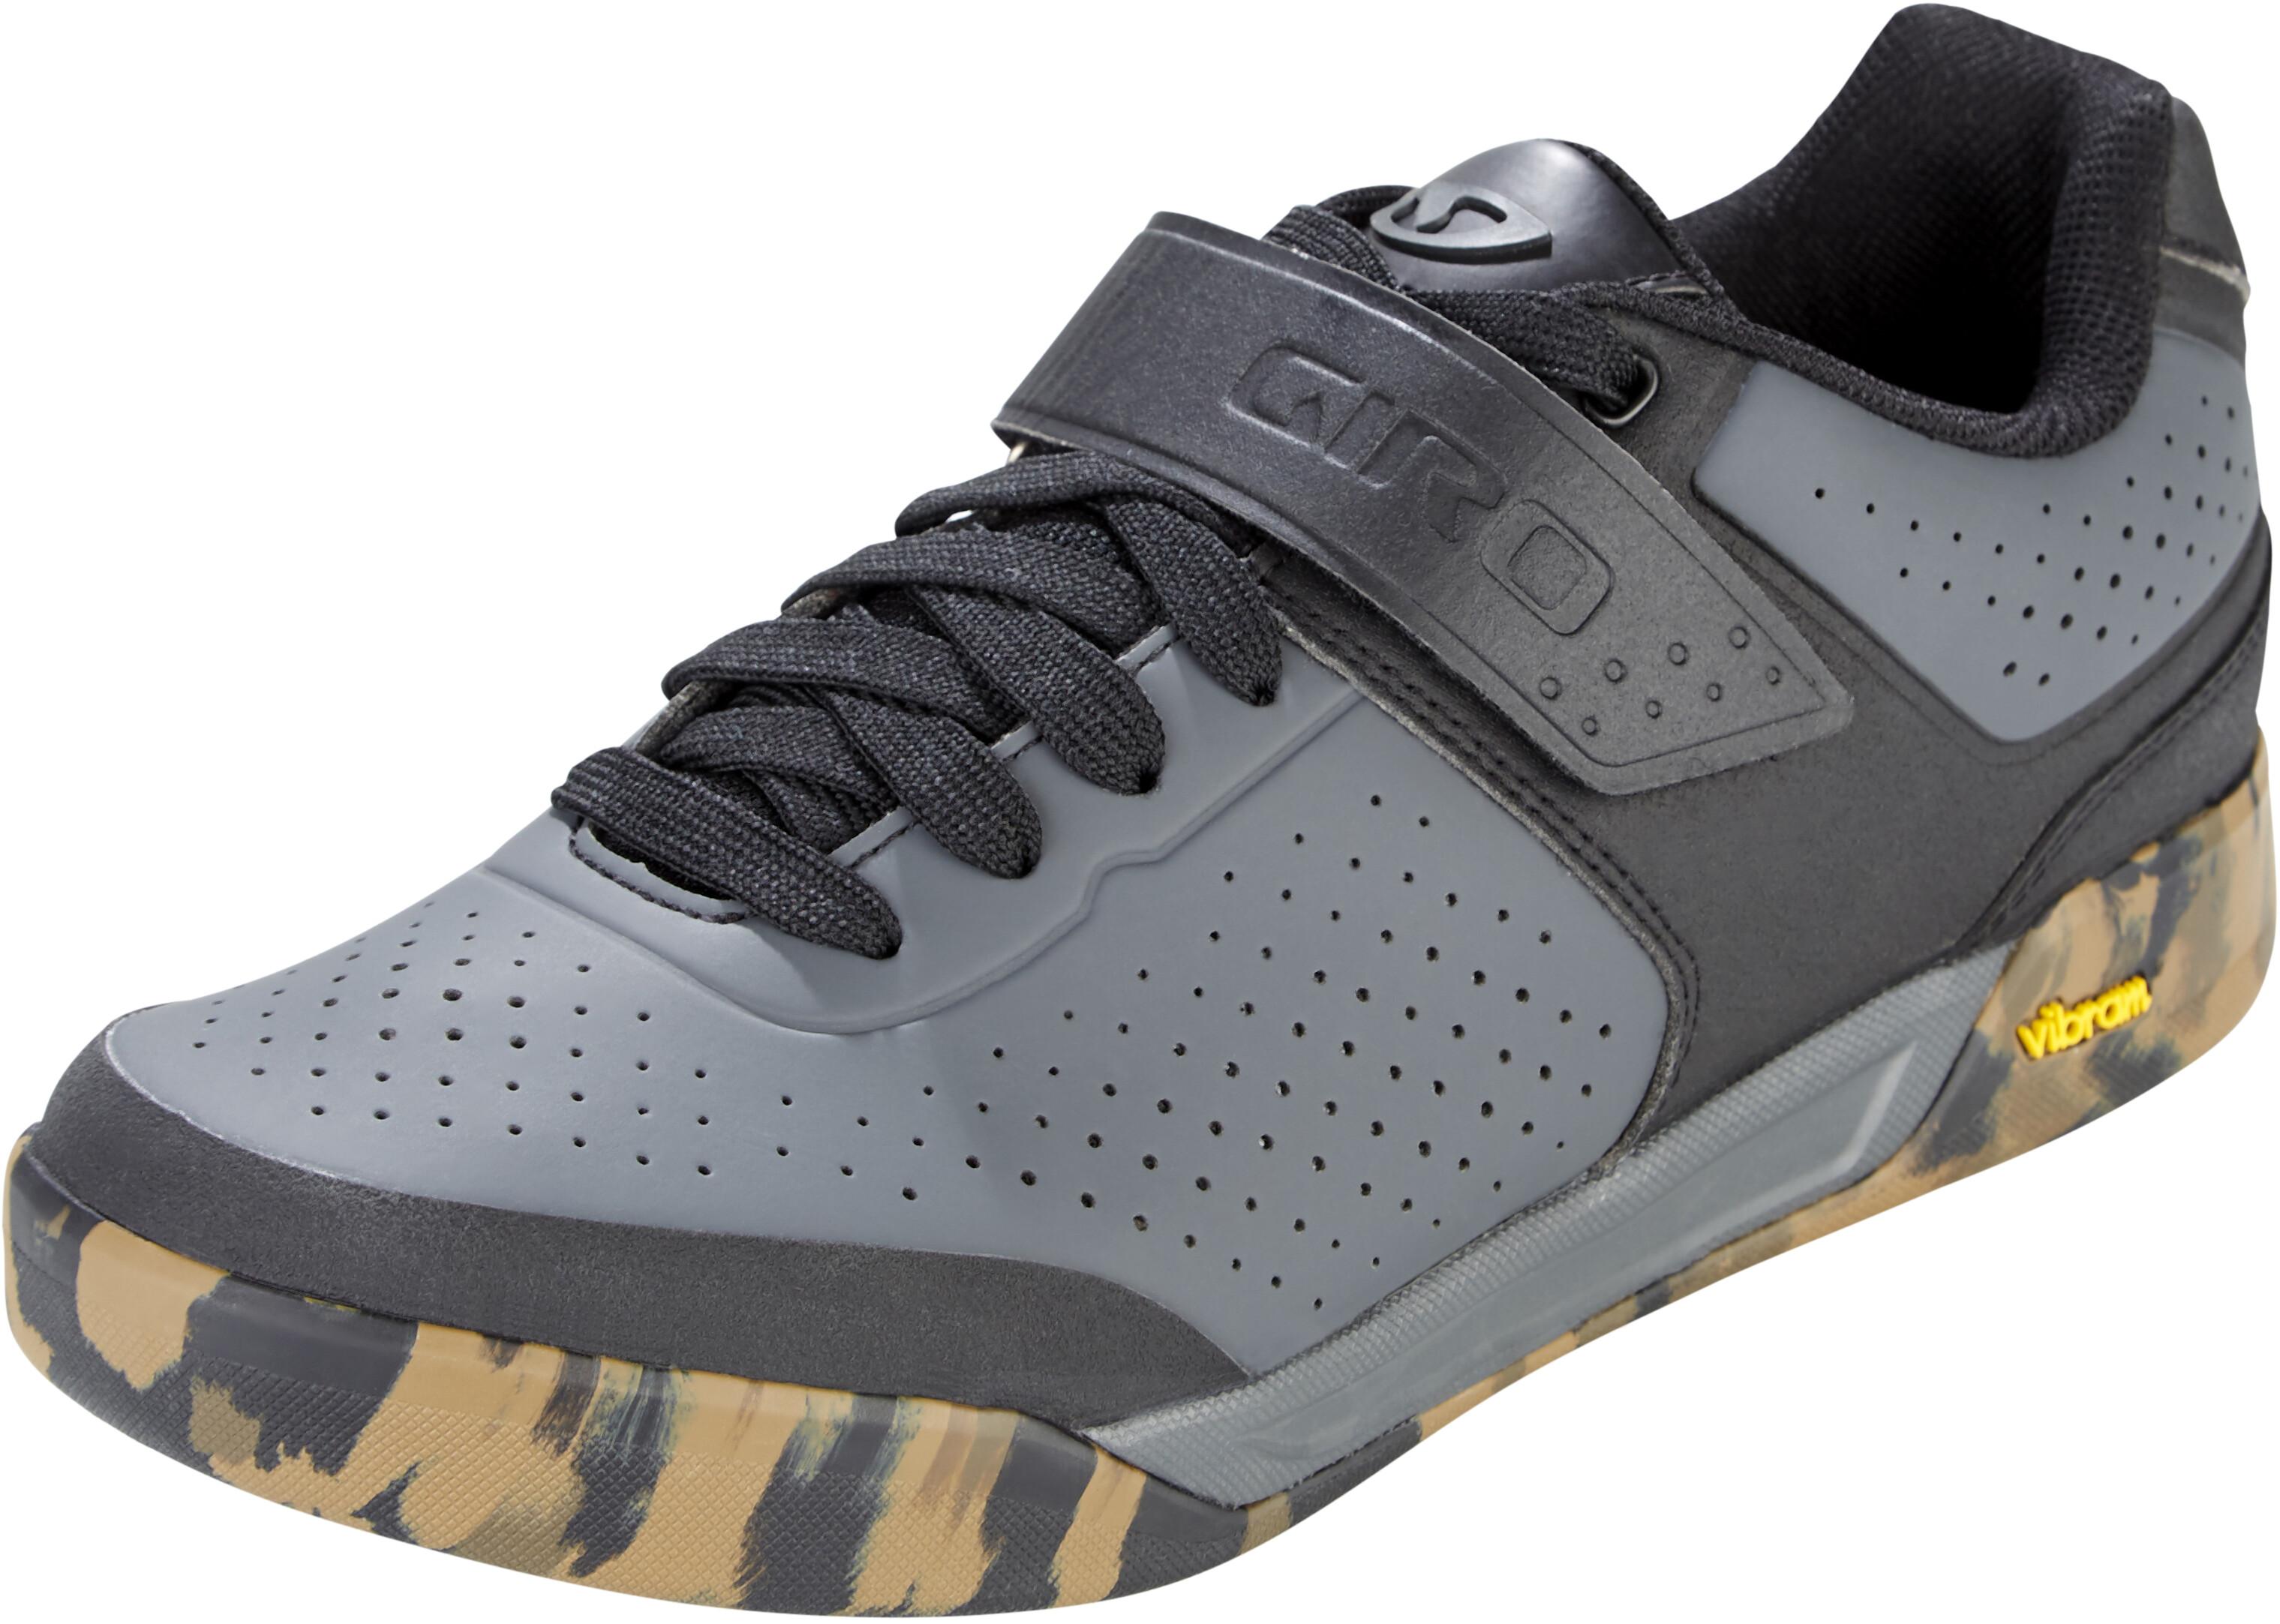 Giro Chamber II Shoes Men black/dark shadow/gum | Addnature.co.uk